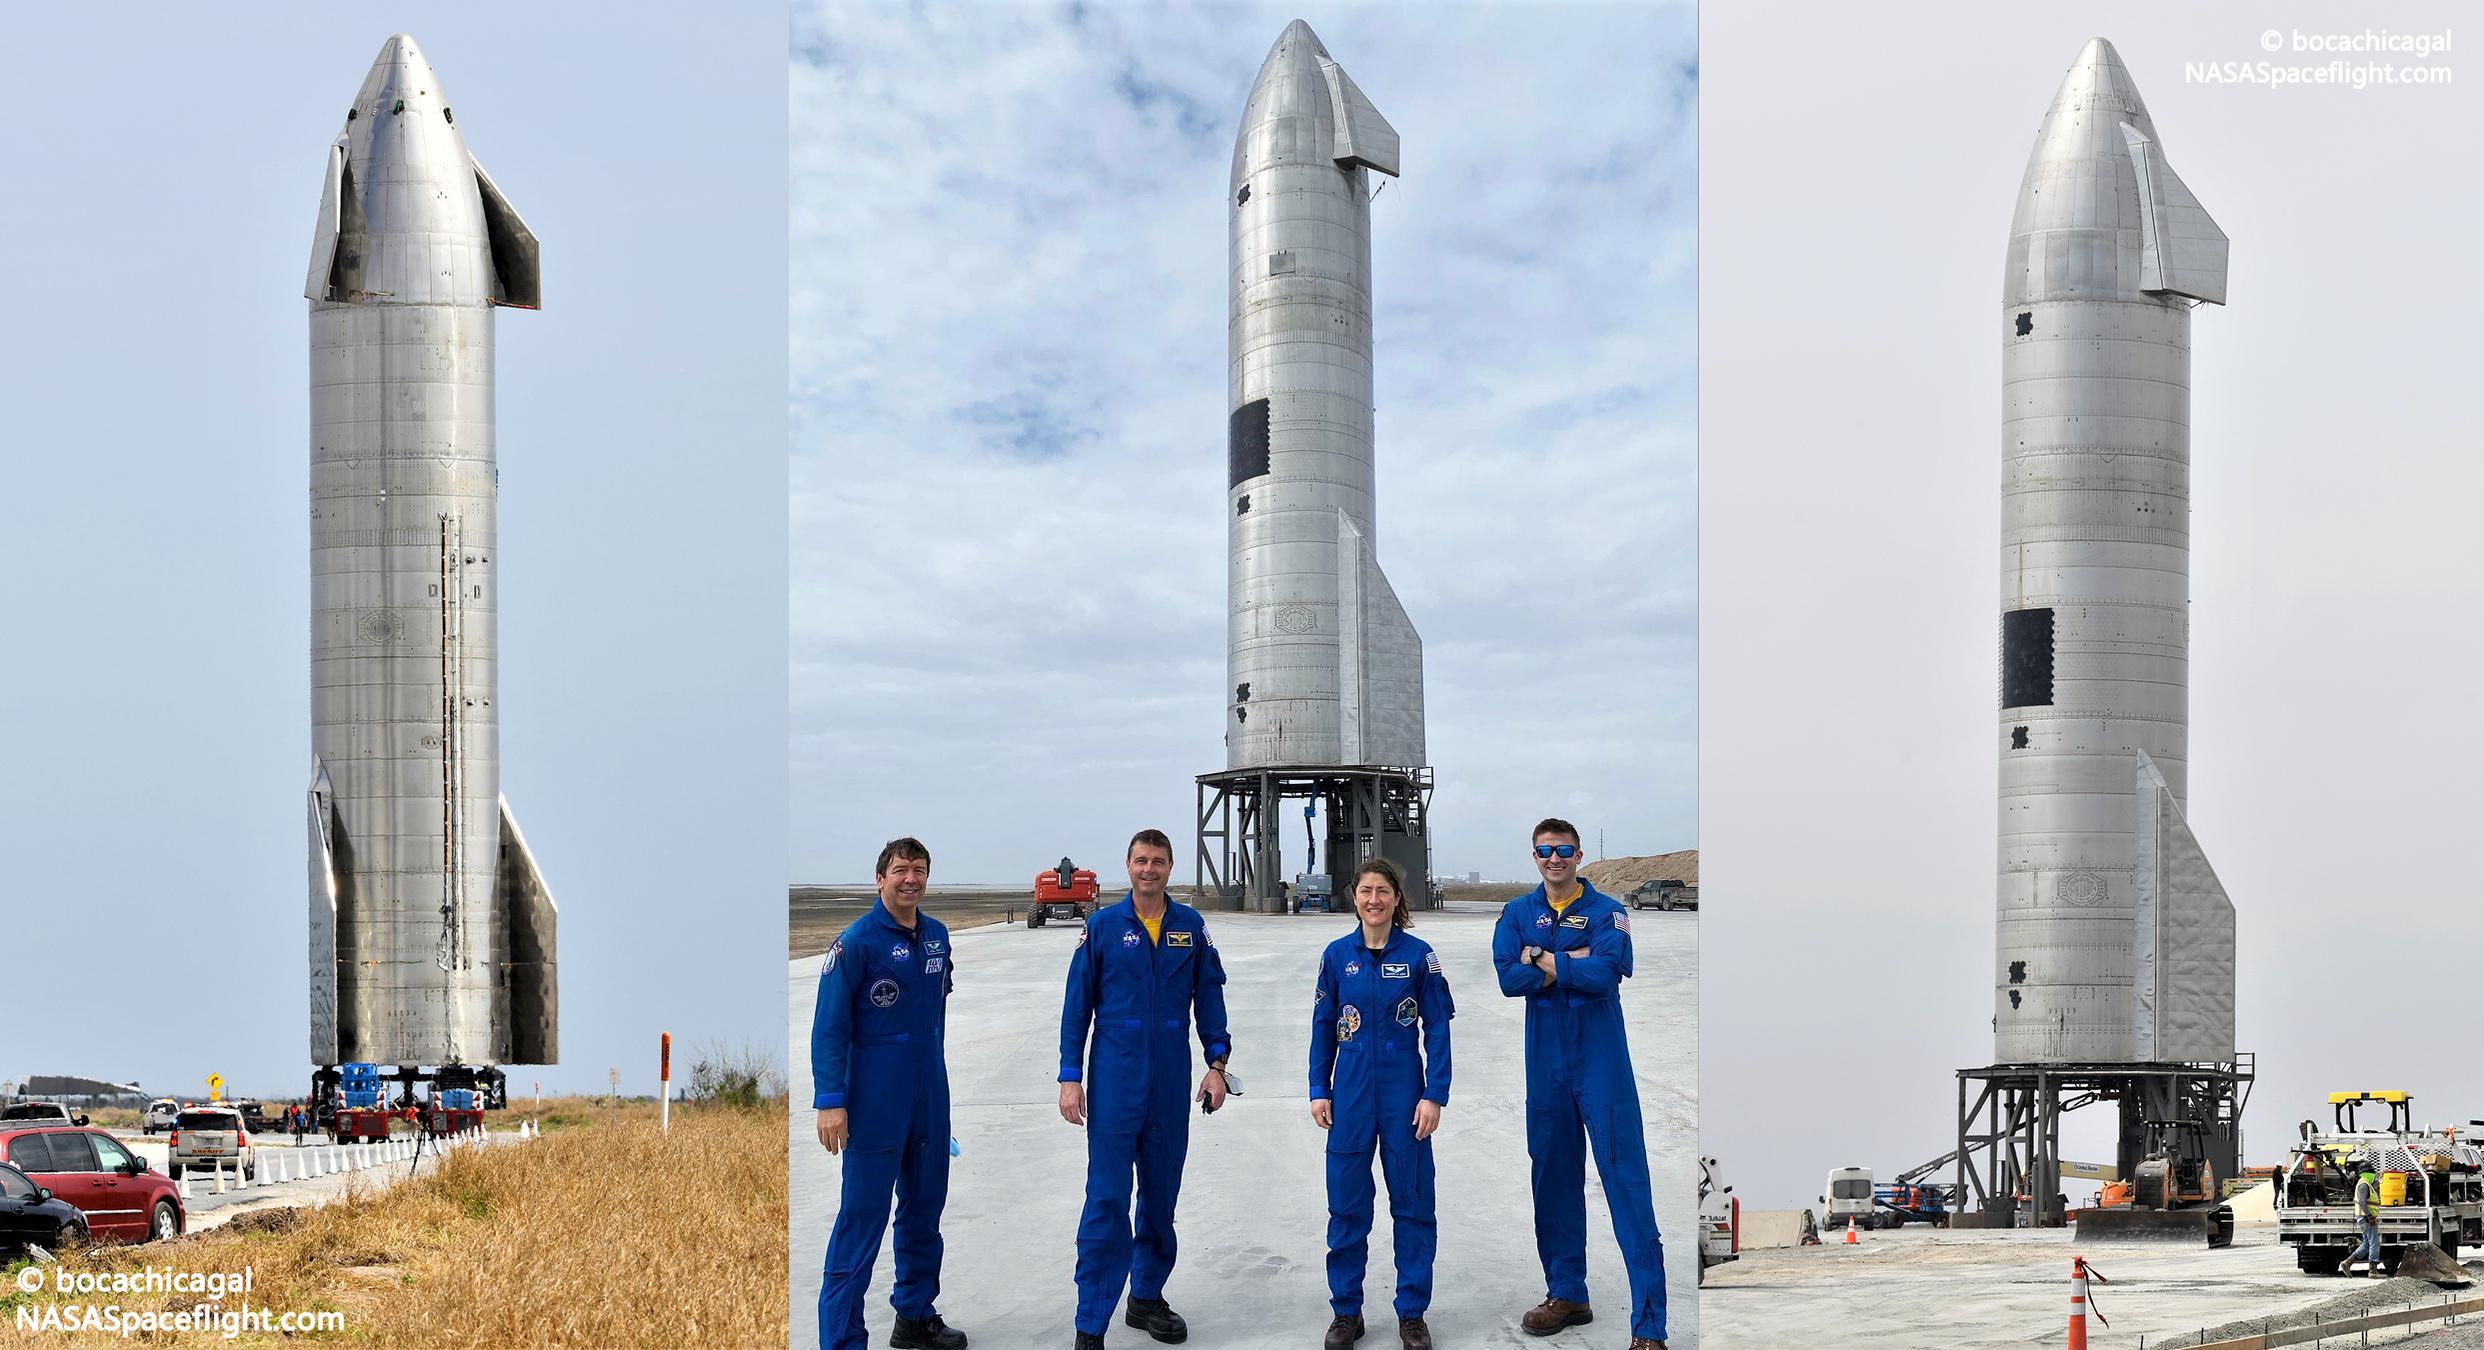 Starship SN11 Boca Chica March 2021 (Christina Koch – bocachicagal) 1 (c)